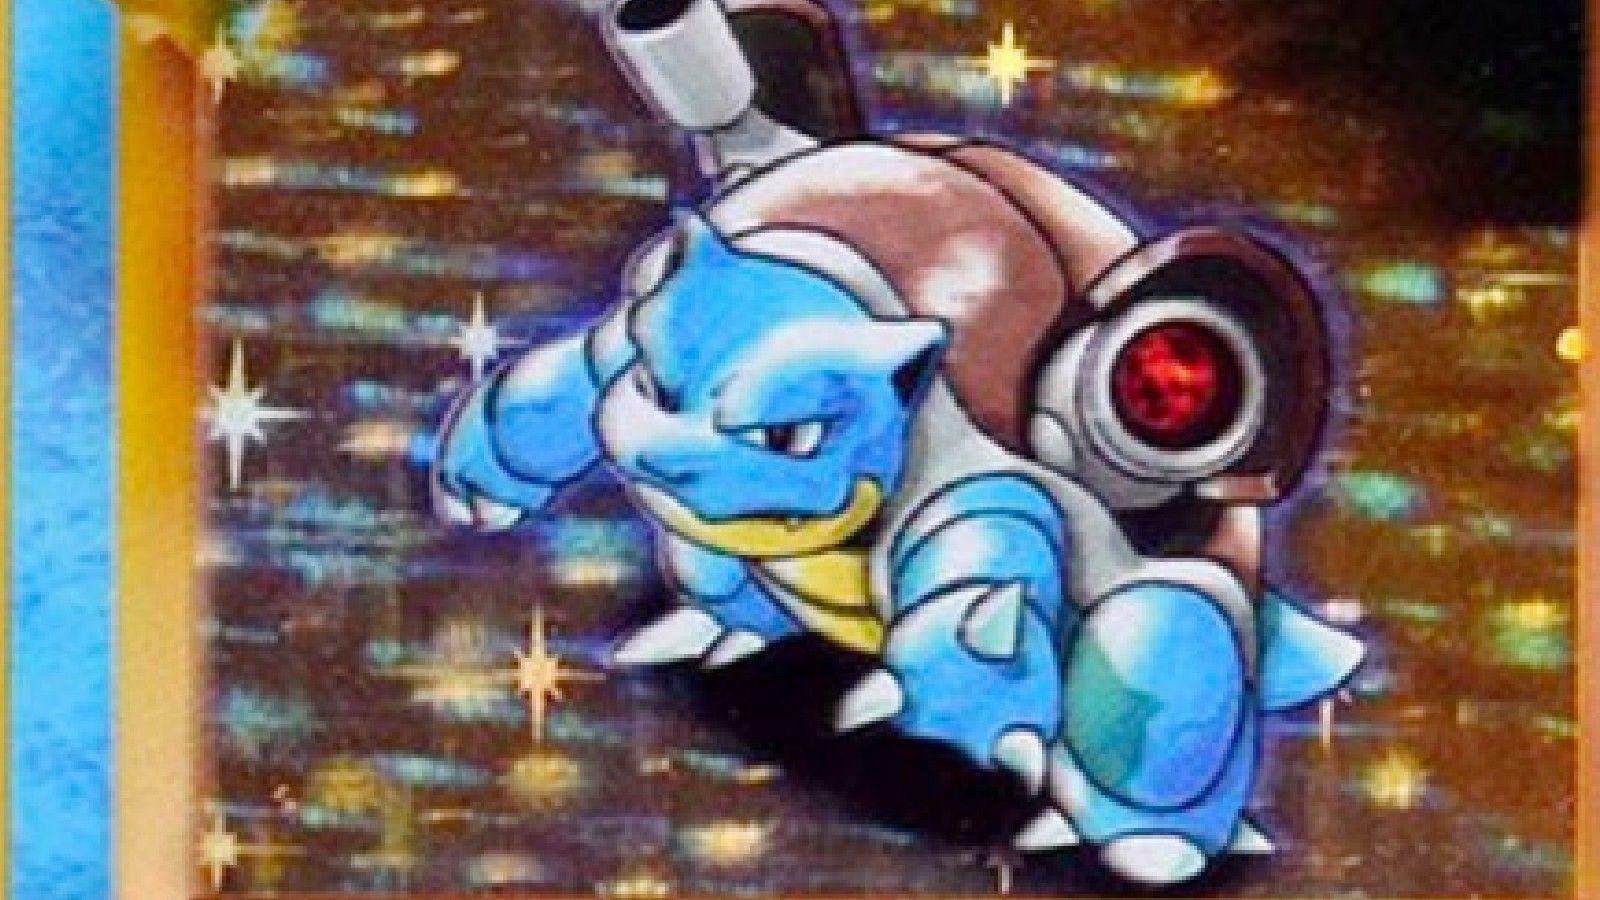 Blastoise cartas pokémon